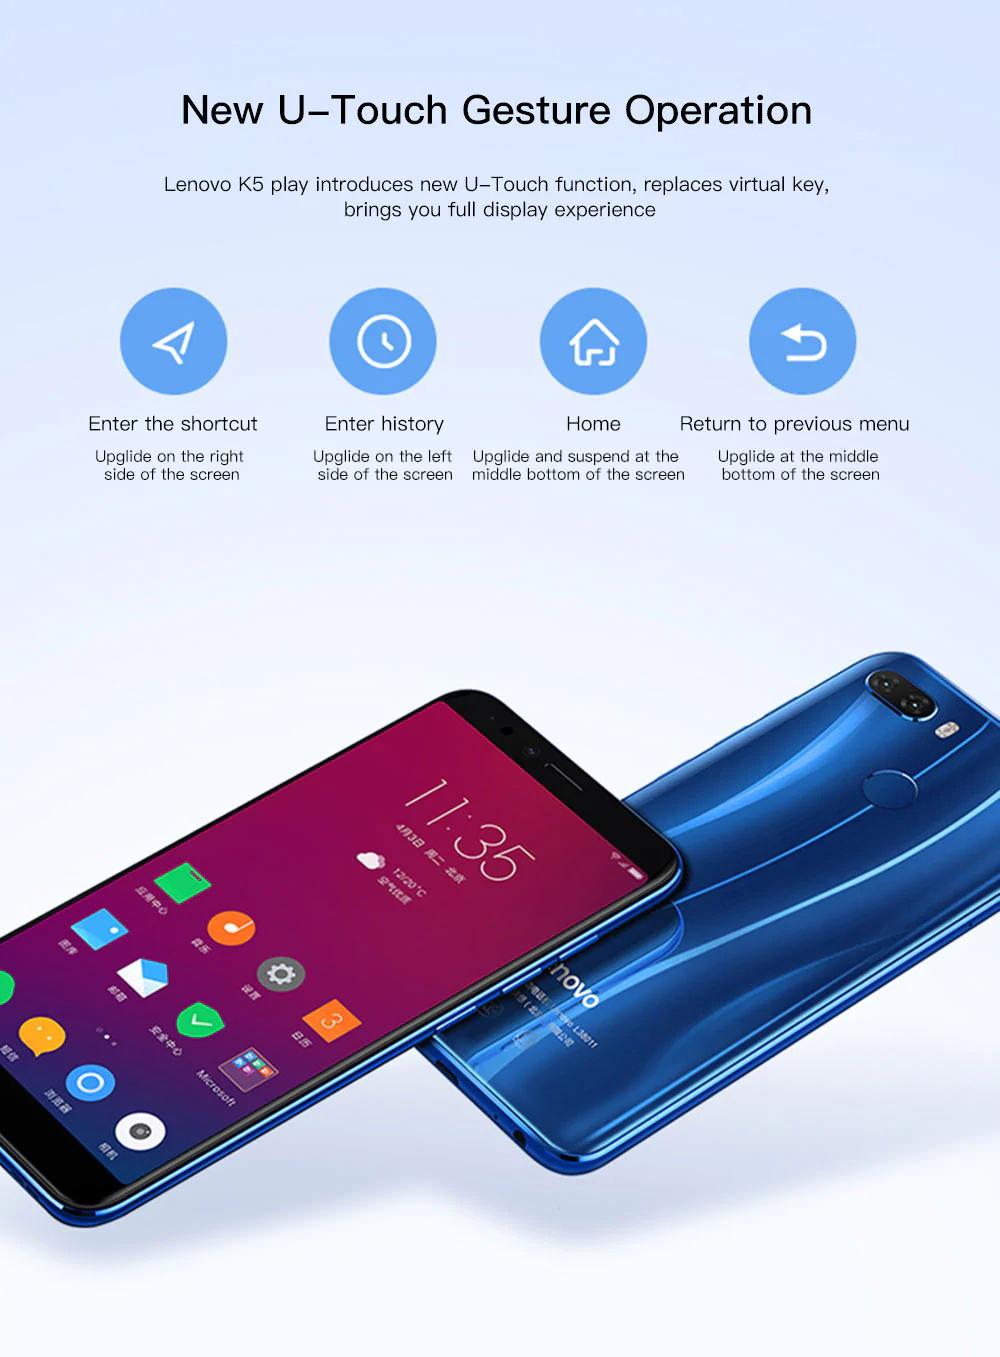 lenovo k5 play 4g smartphone price